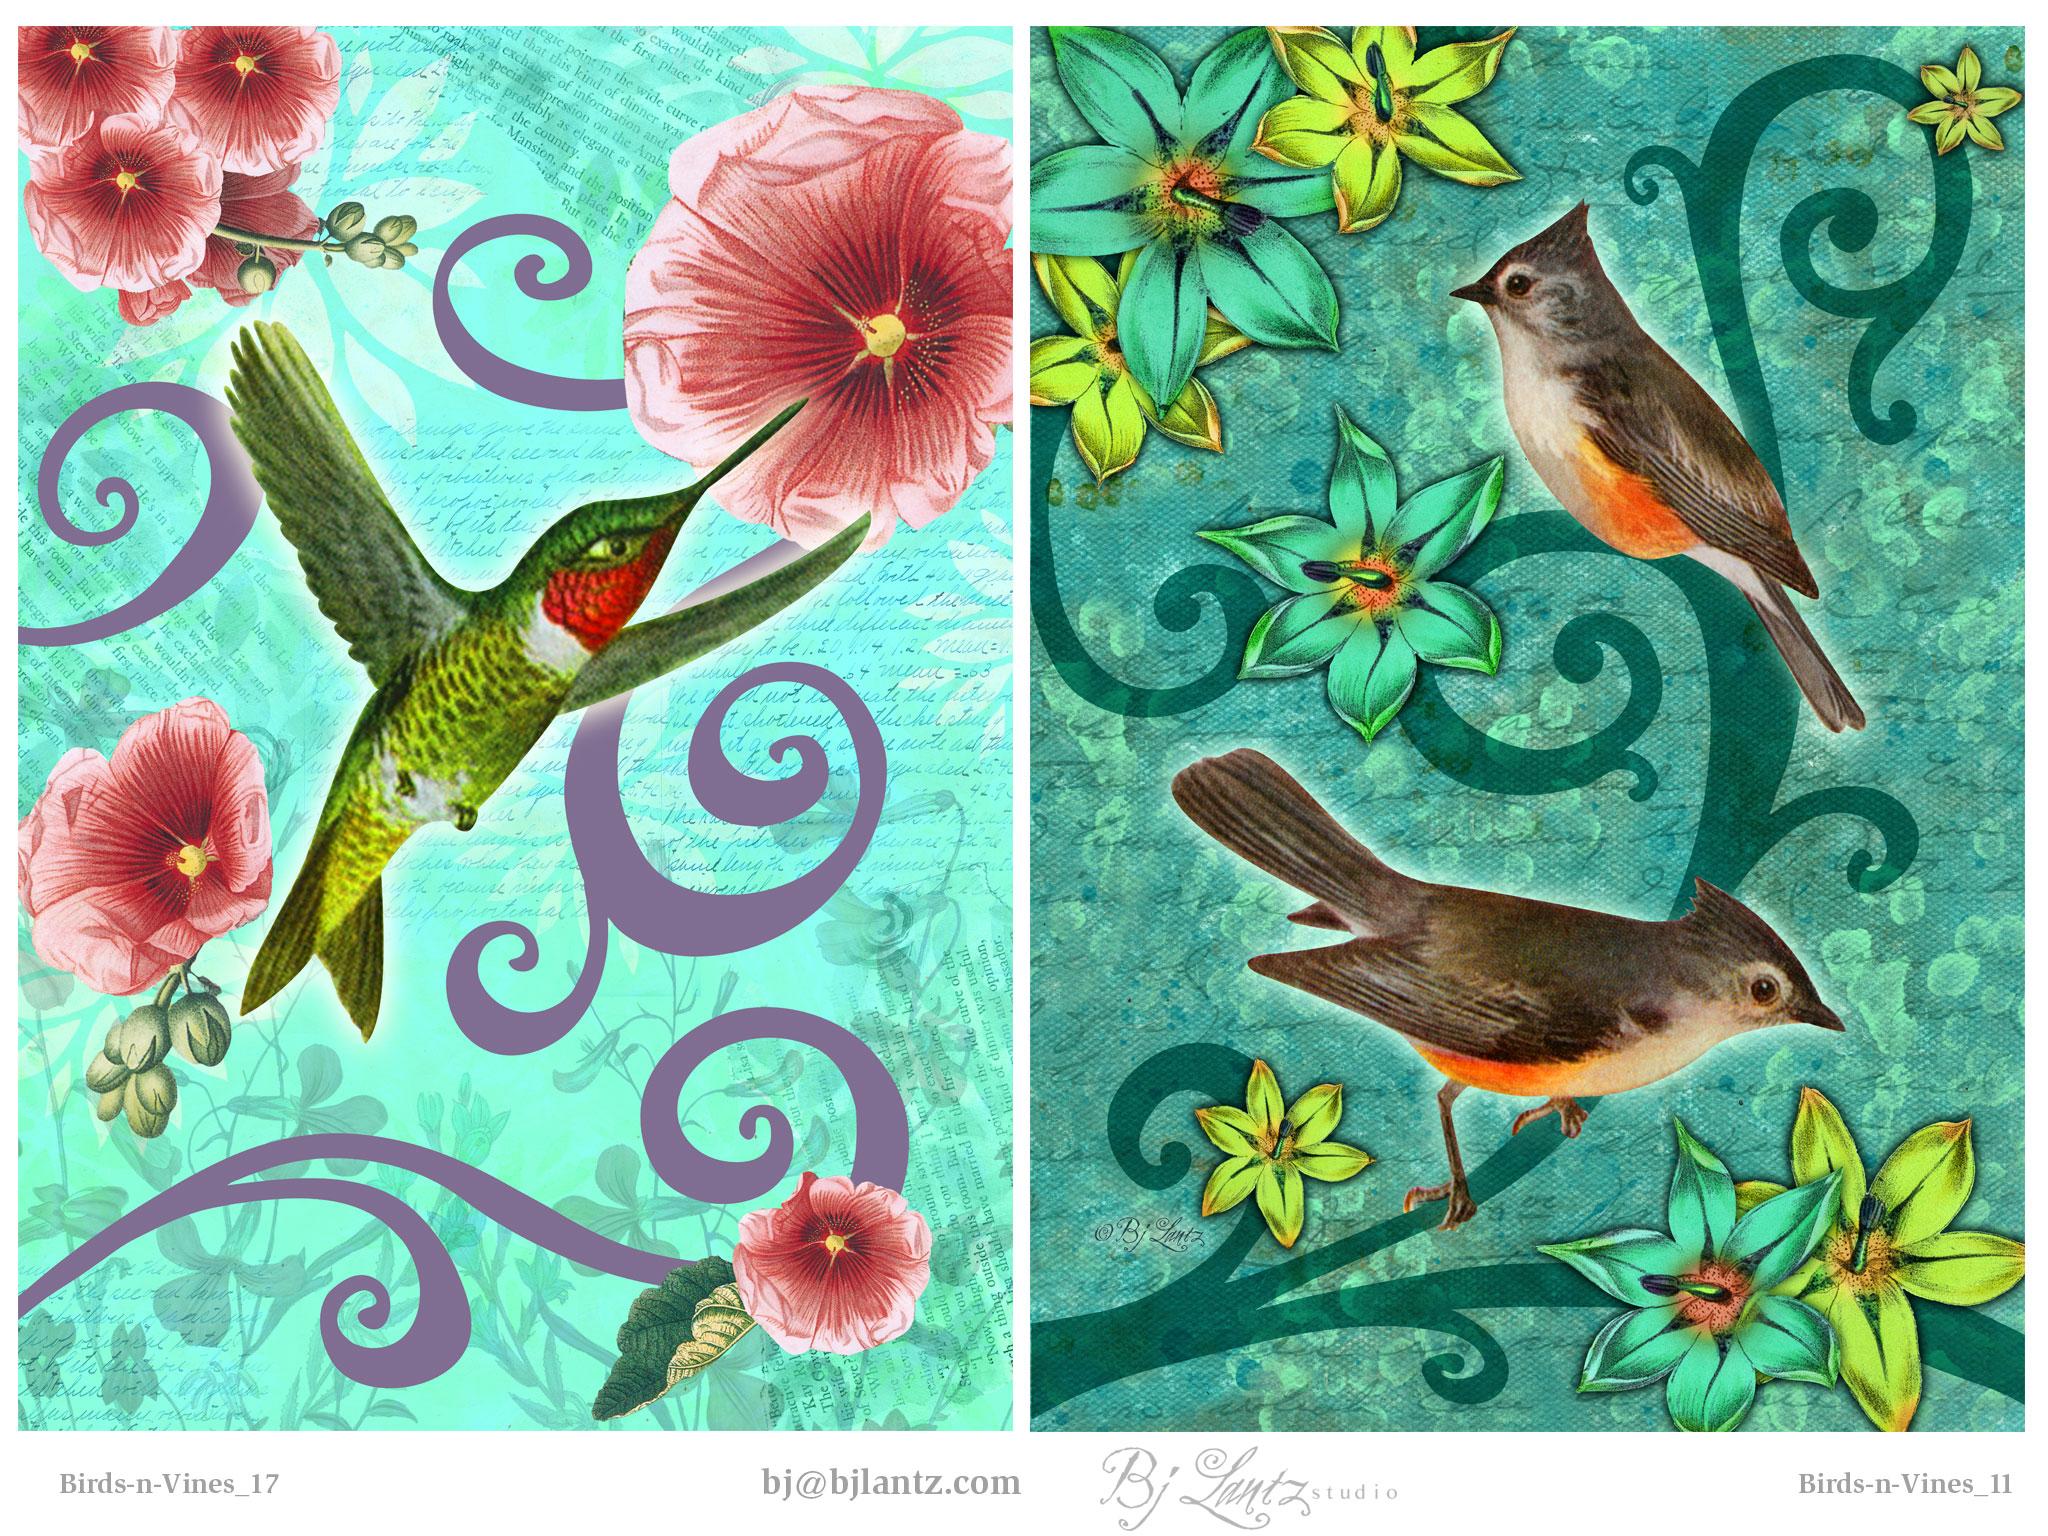 Birds-n-Vines_BJLantz_2.jpg